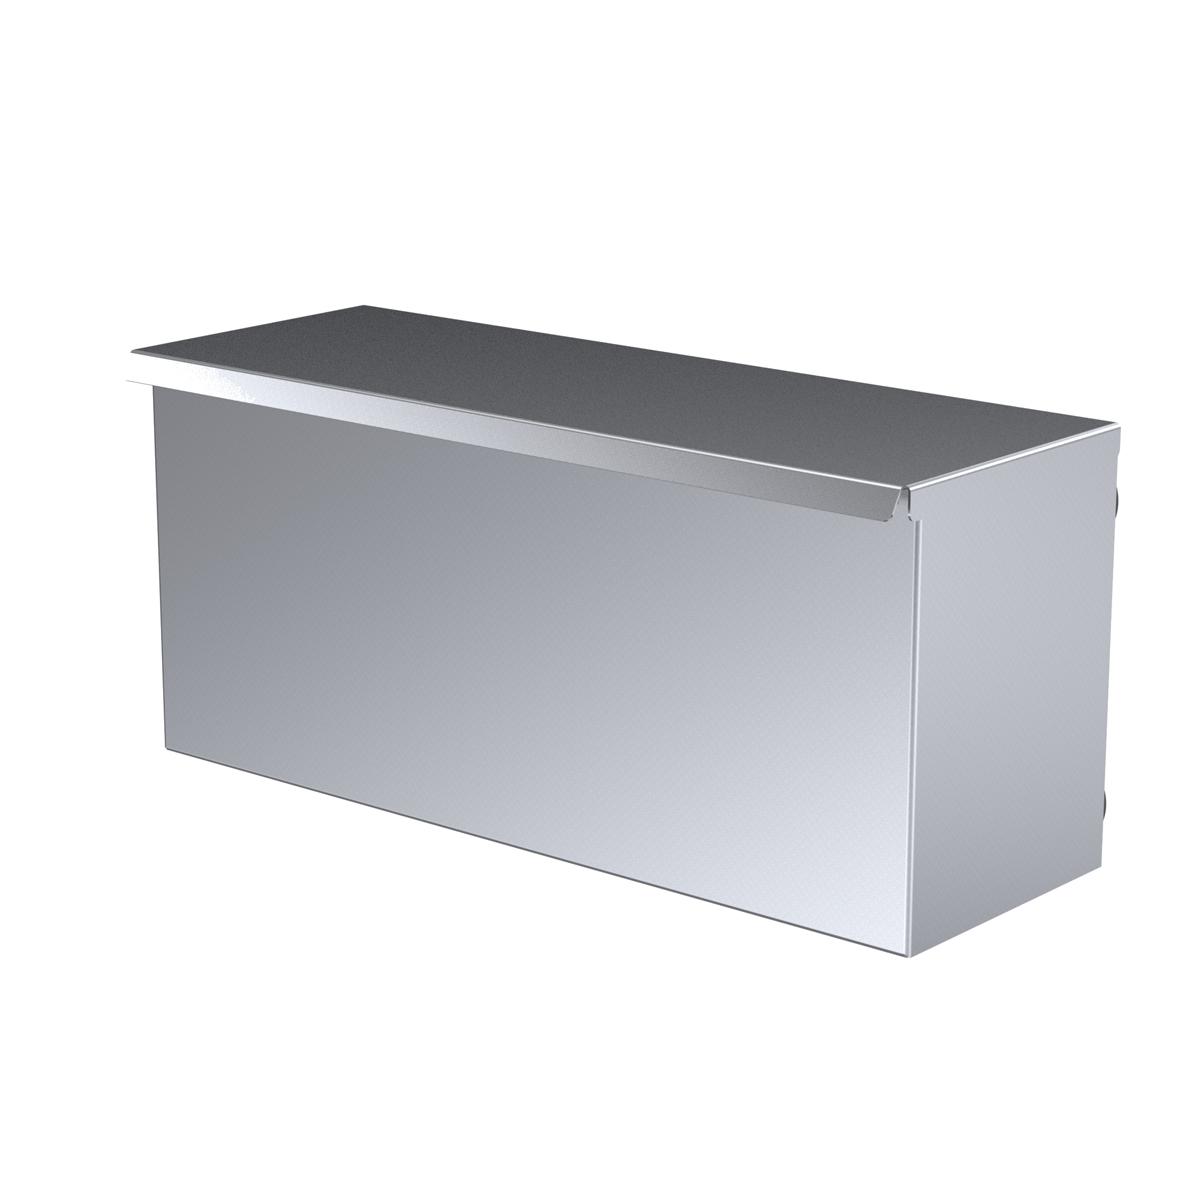 Spenderbox Kombi, ArtNr.: EWSP_KOMBI